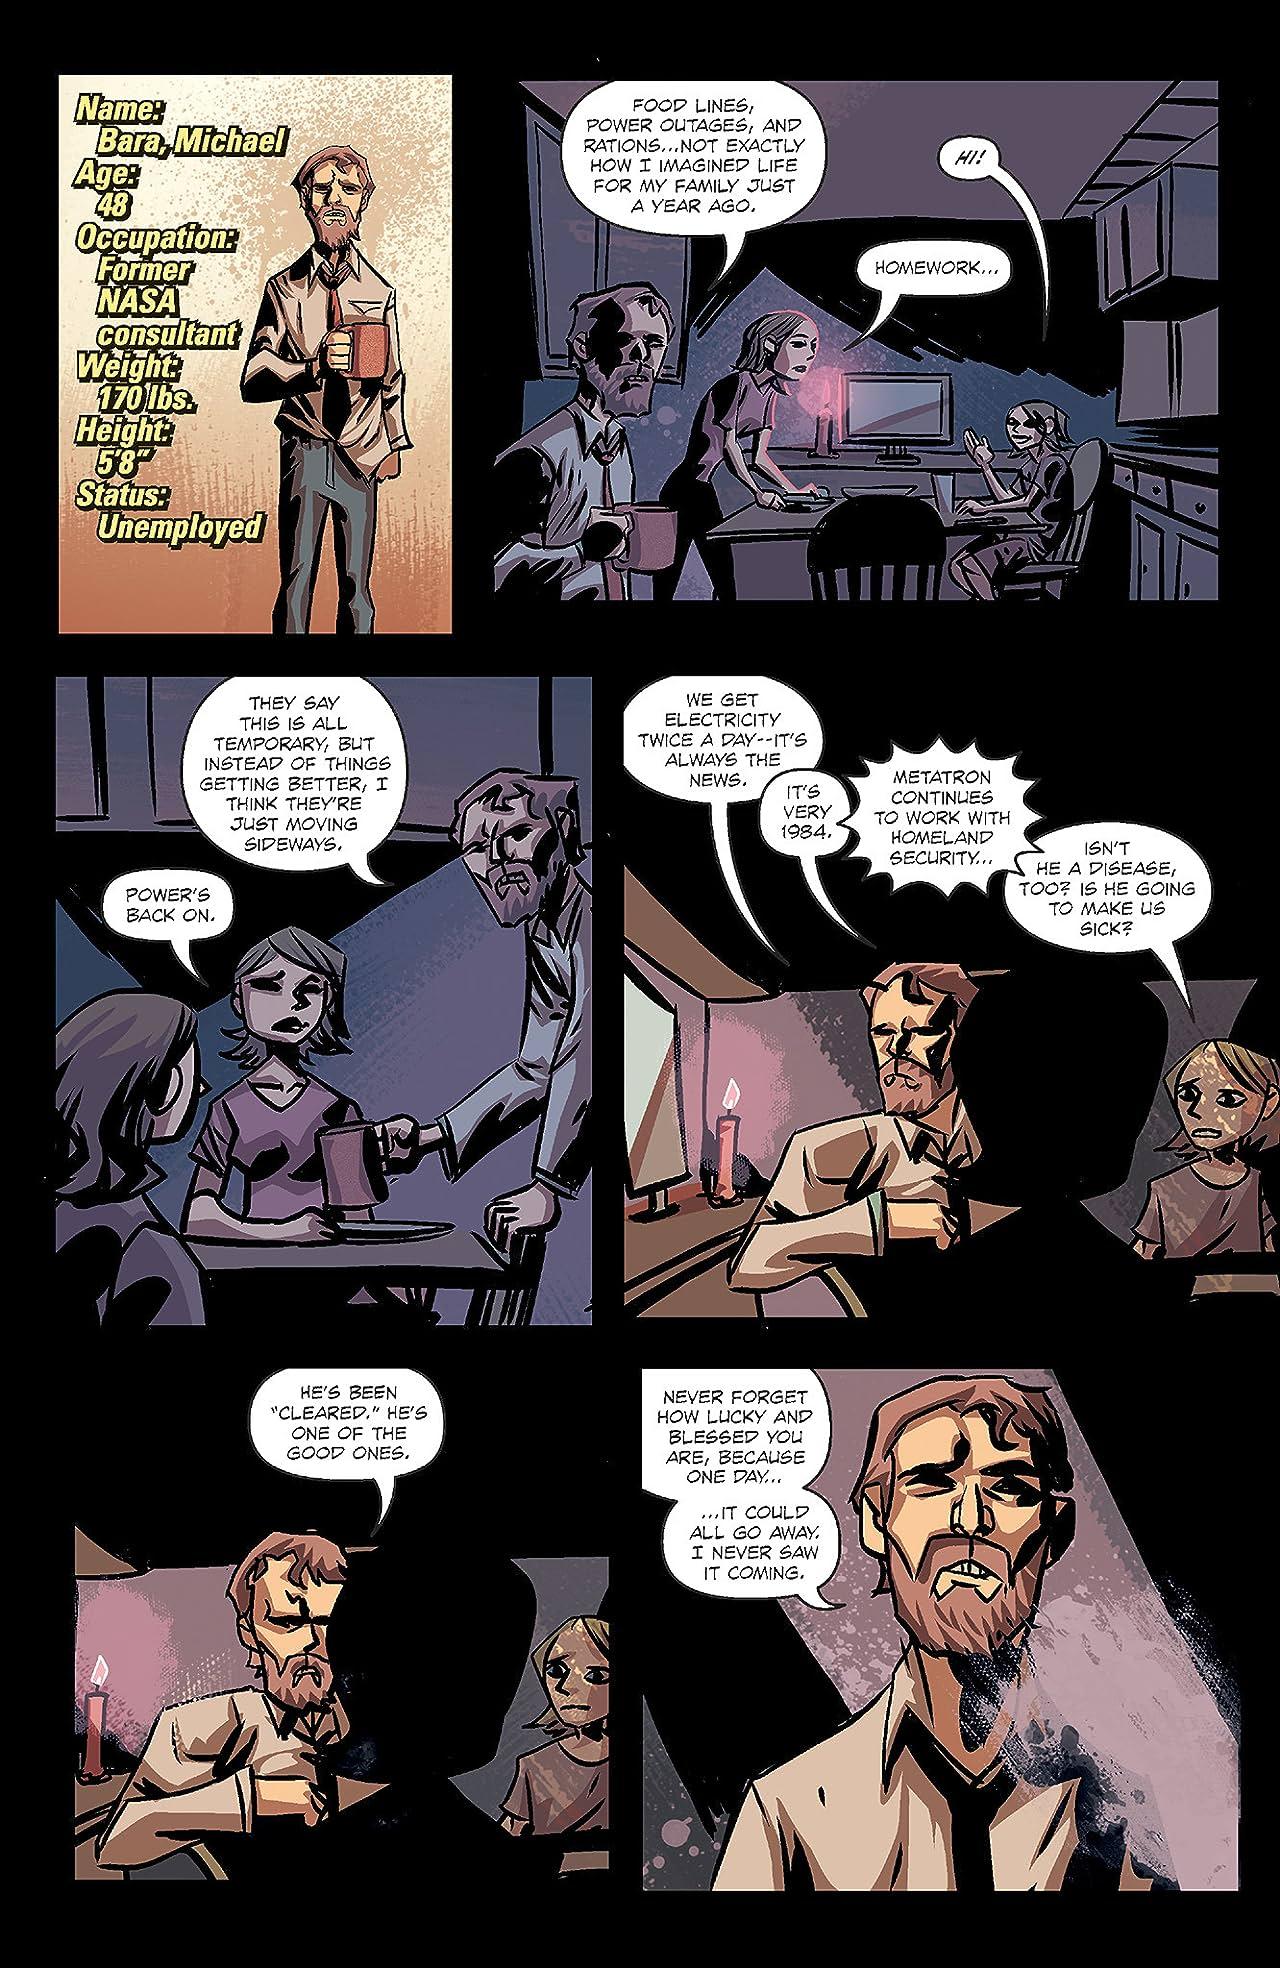 Michael Avon Oeming's The Victories #6: Posthuman Part 1